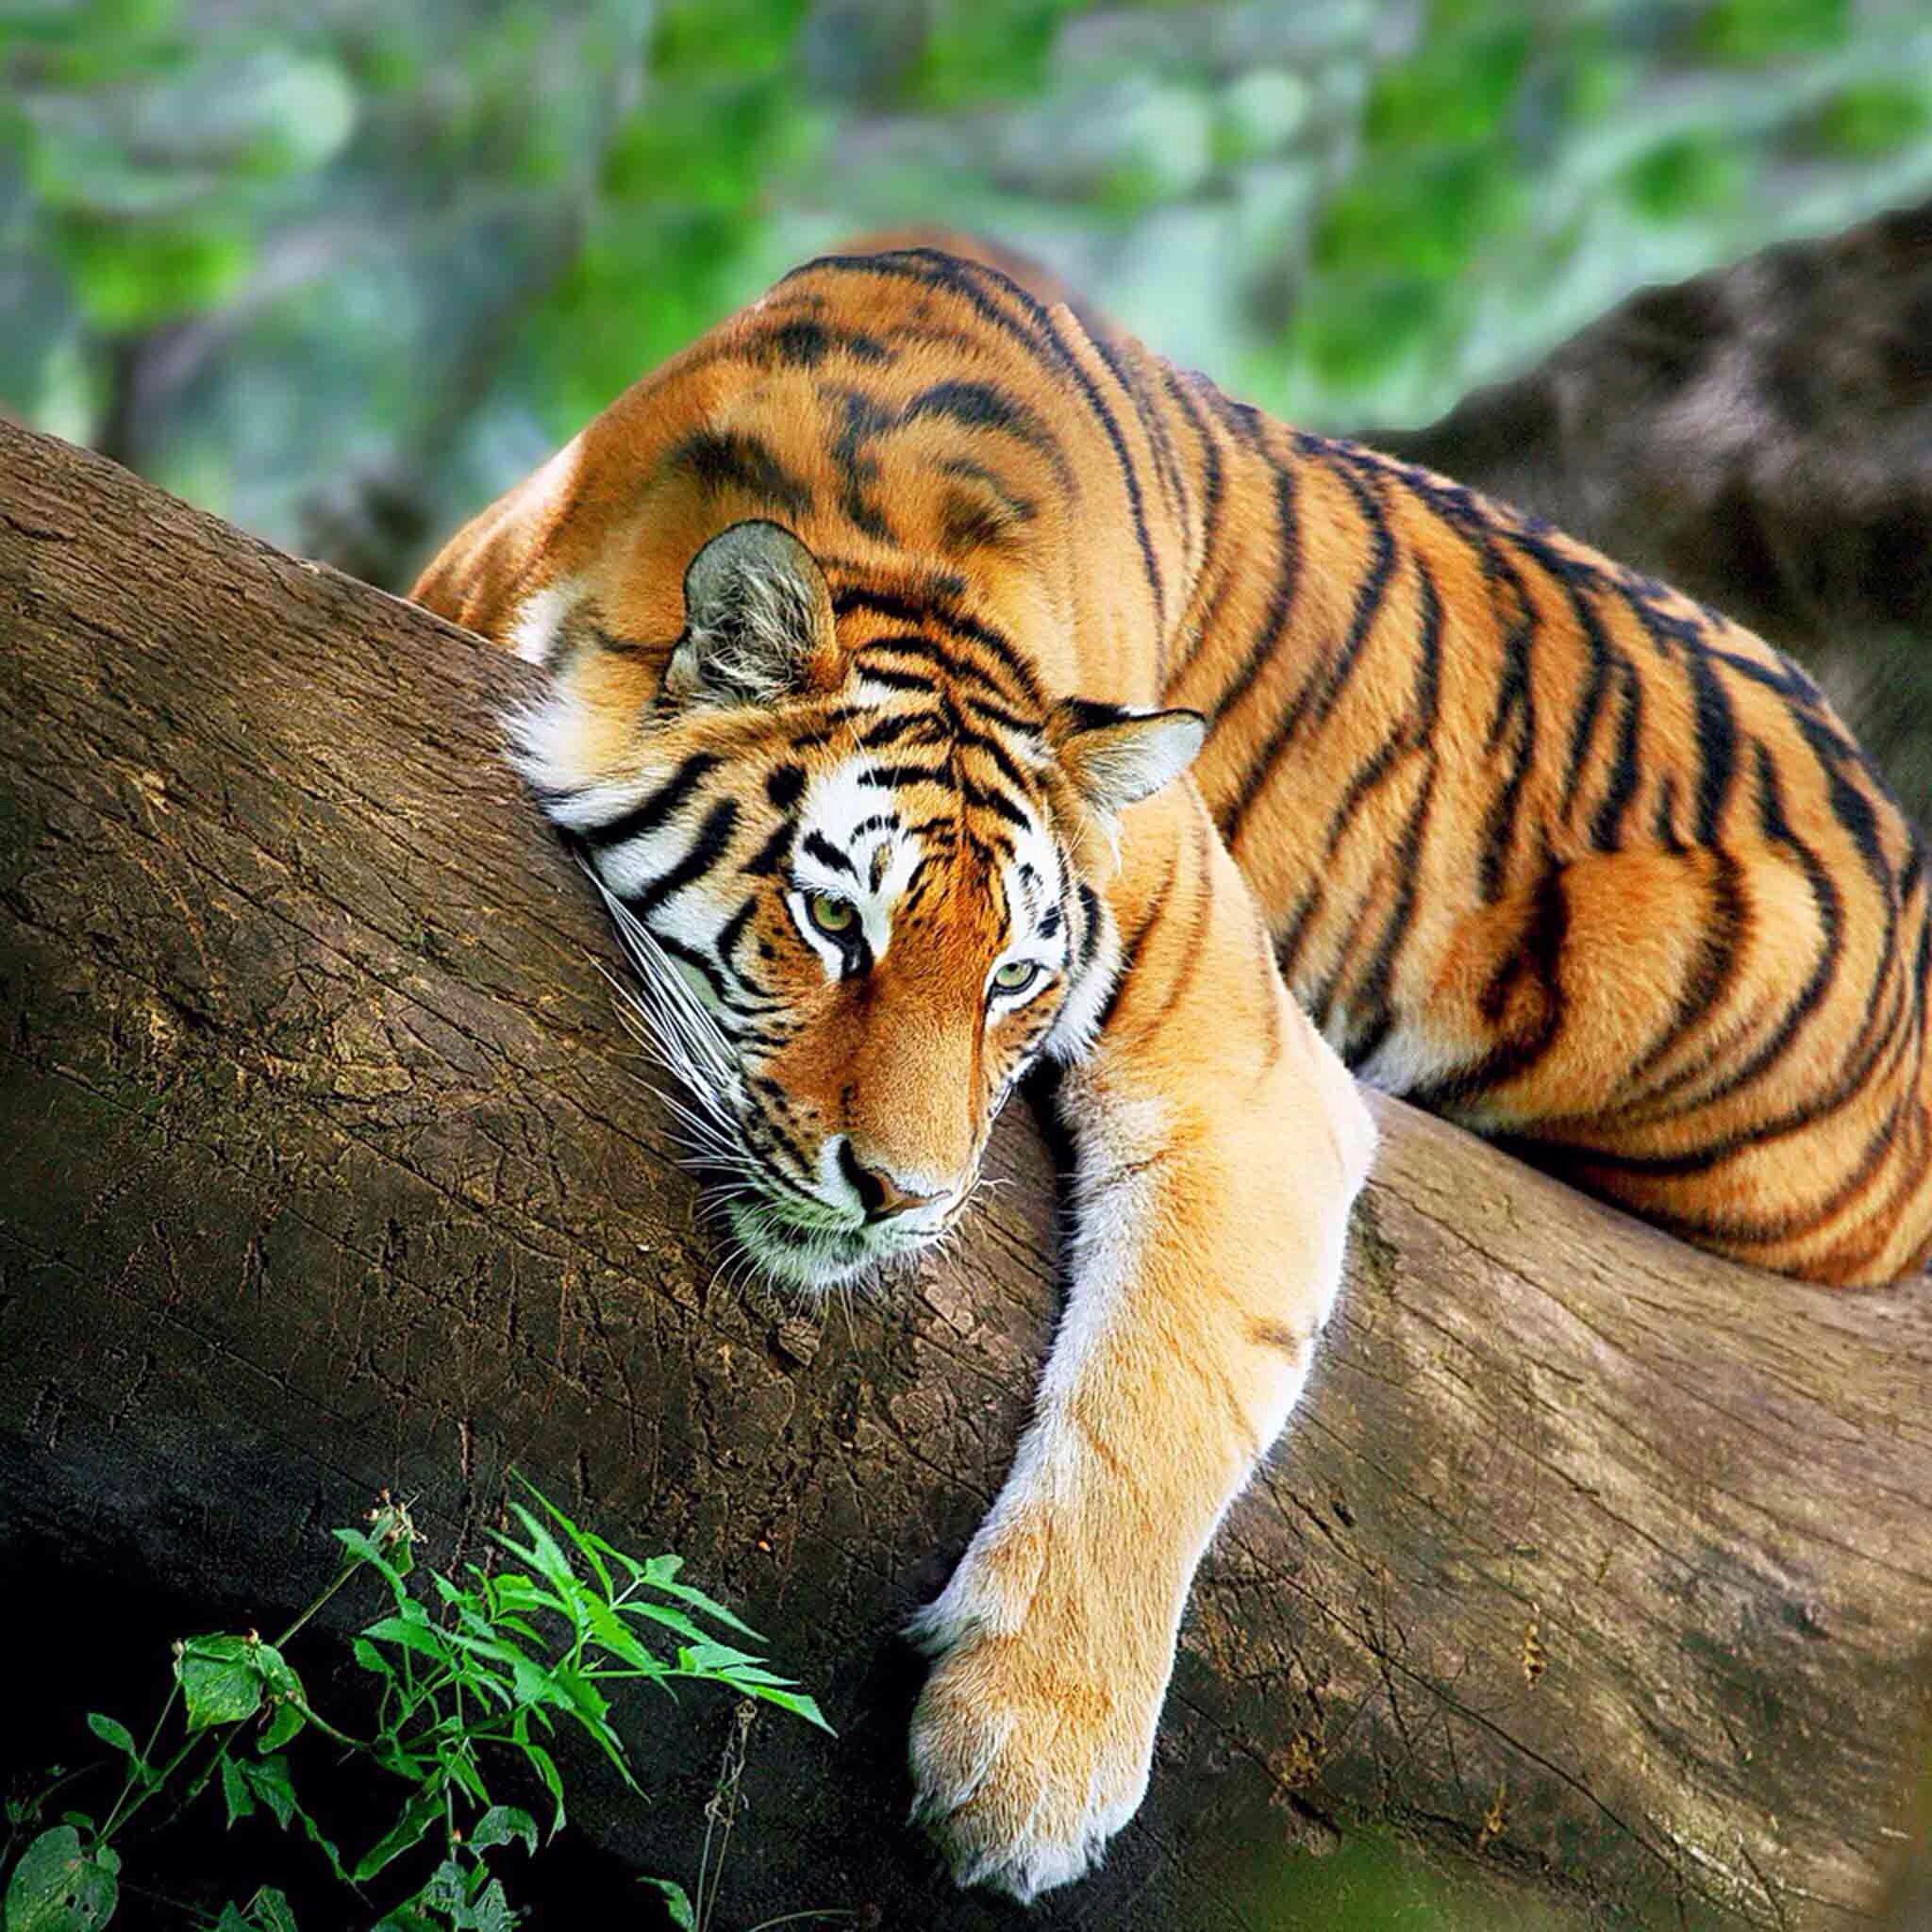 Bengal tiger yawning showing teeth and tongue Stock Photo ... |Bengal Tiger Tired